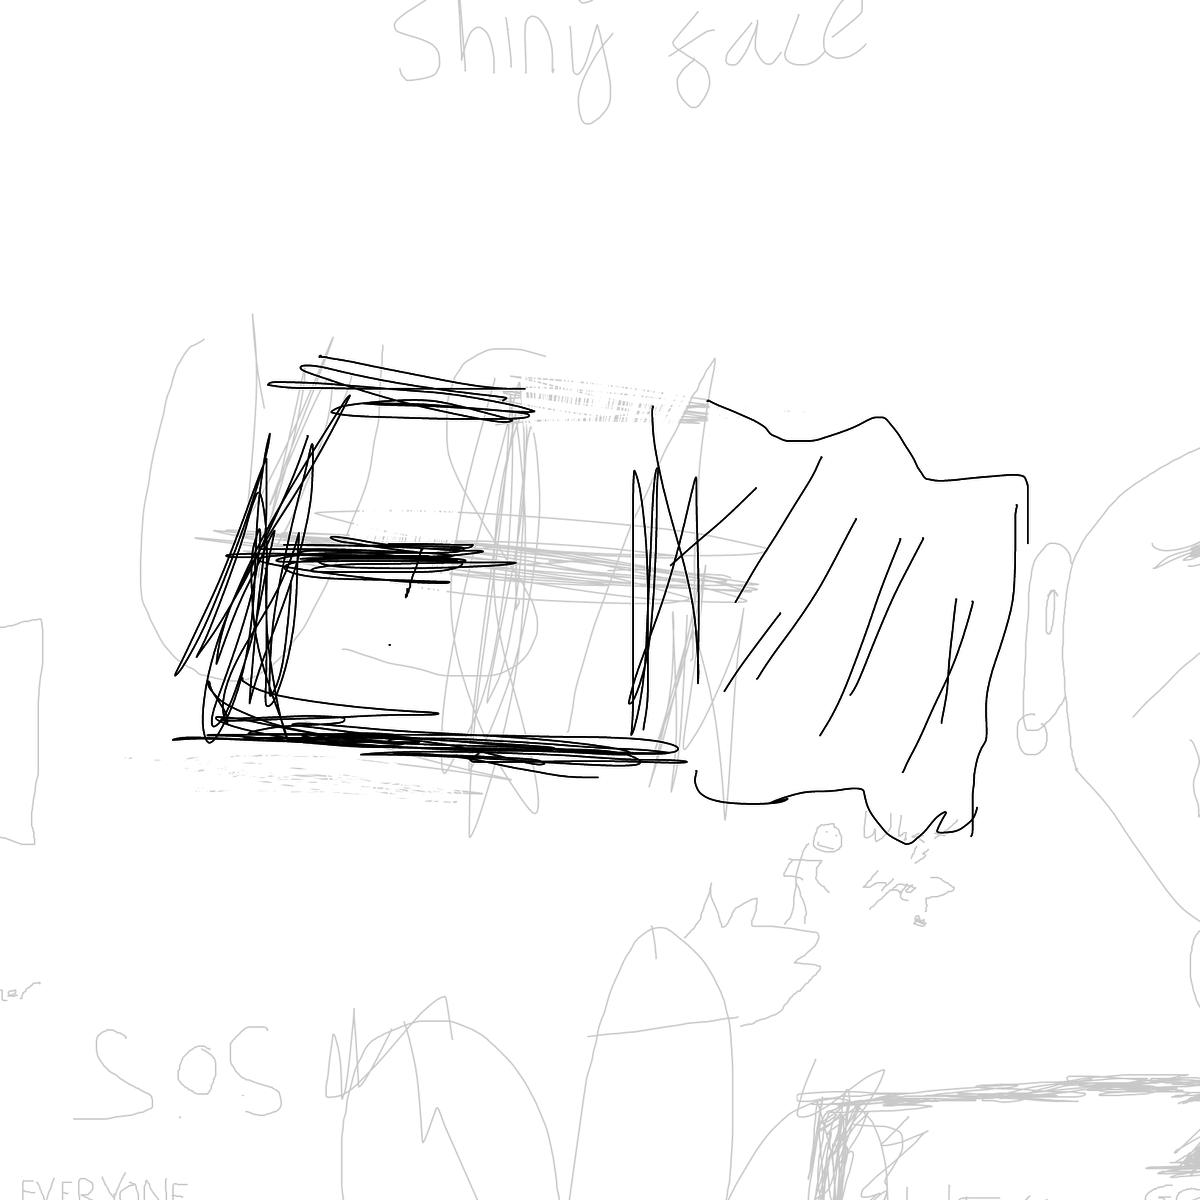 BAAAM drawing#19004 lat:51.5004425048828100lng: -0.1238106042146683